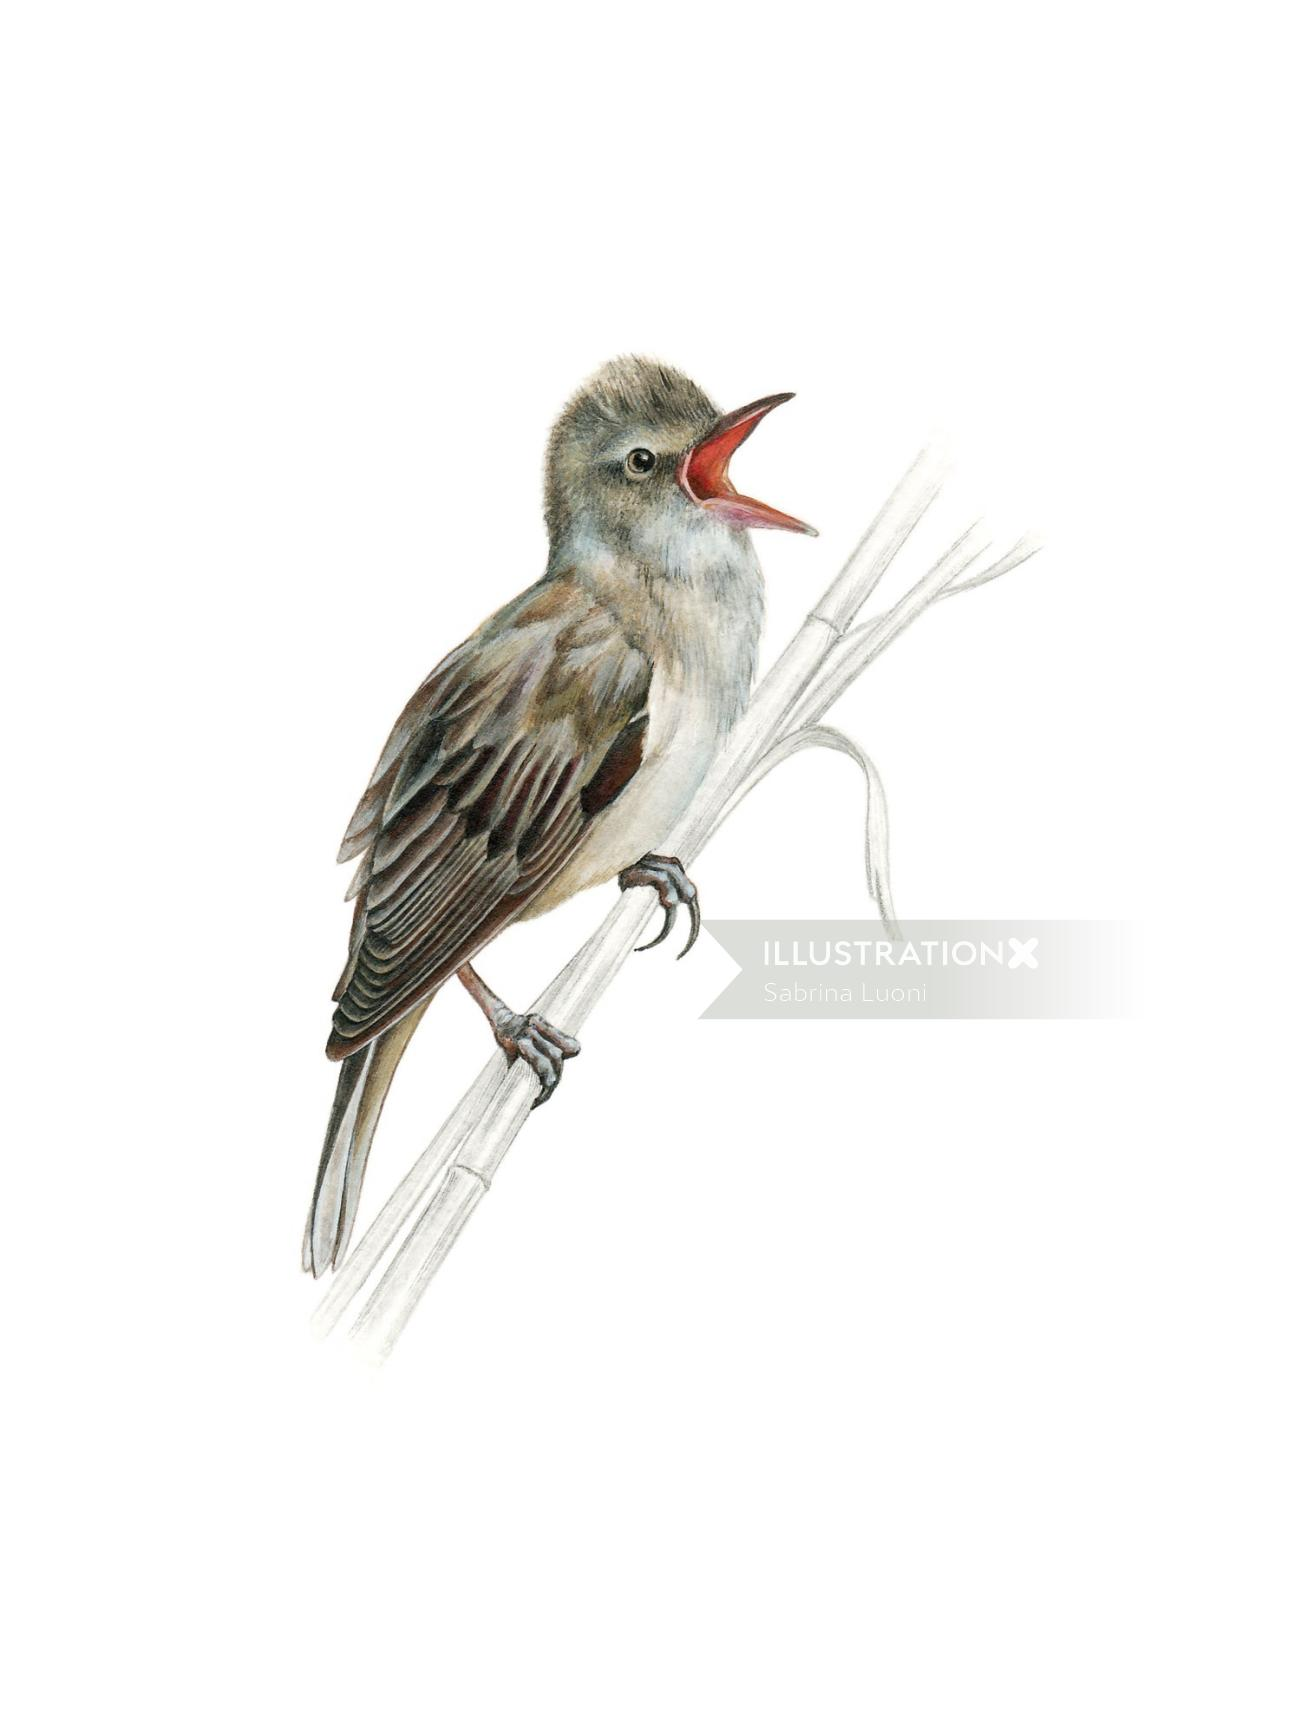 GreatReed Warbler (Acrocephalus arundinaceus)